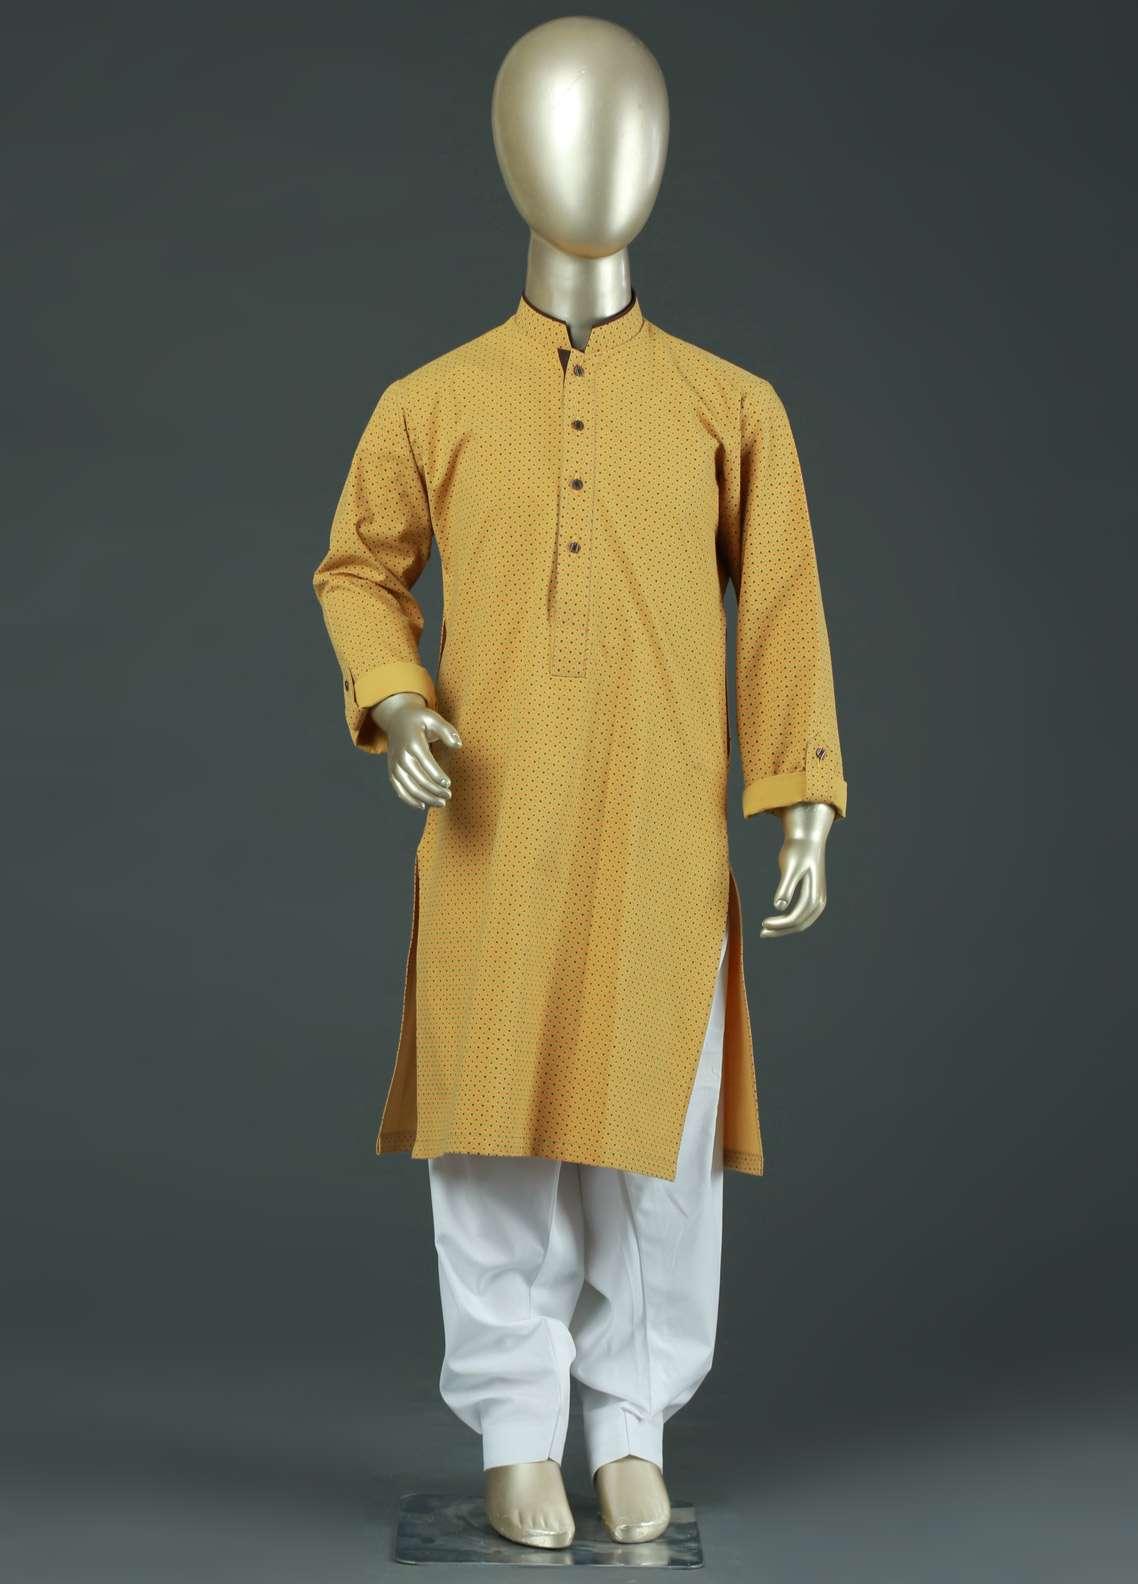 Aizaz Zafar Cotton Formal Kurtas for Boys -  AZ19B 220 Yellow